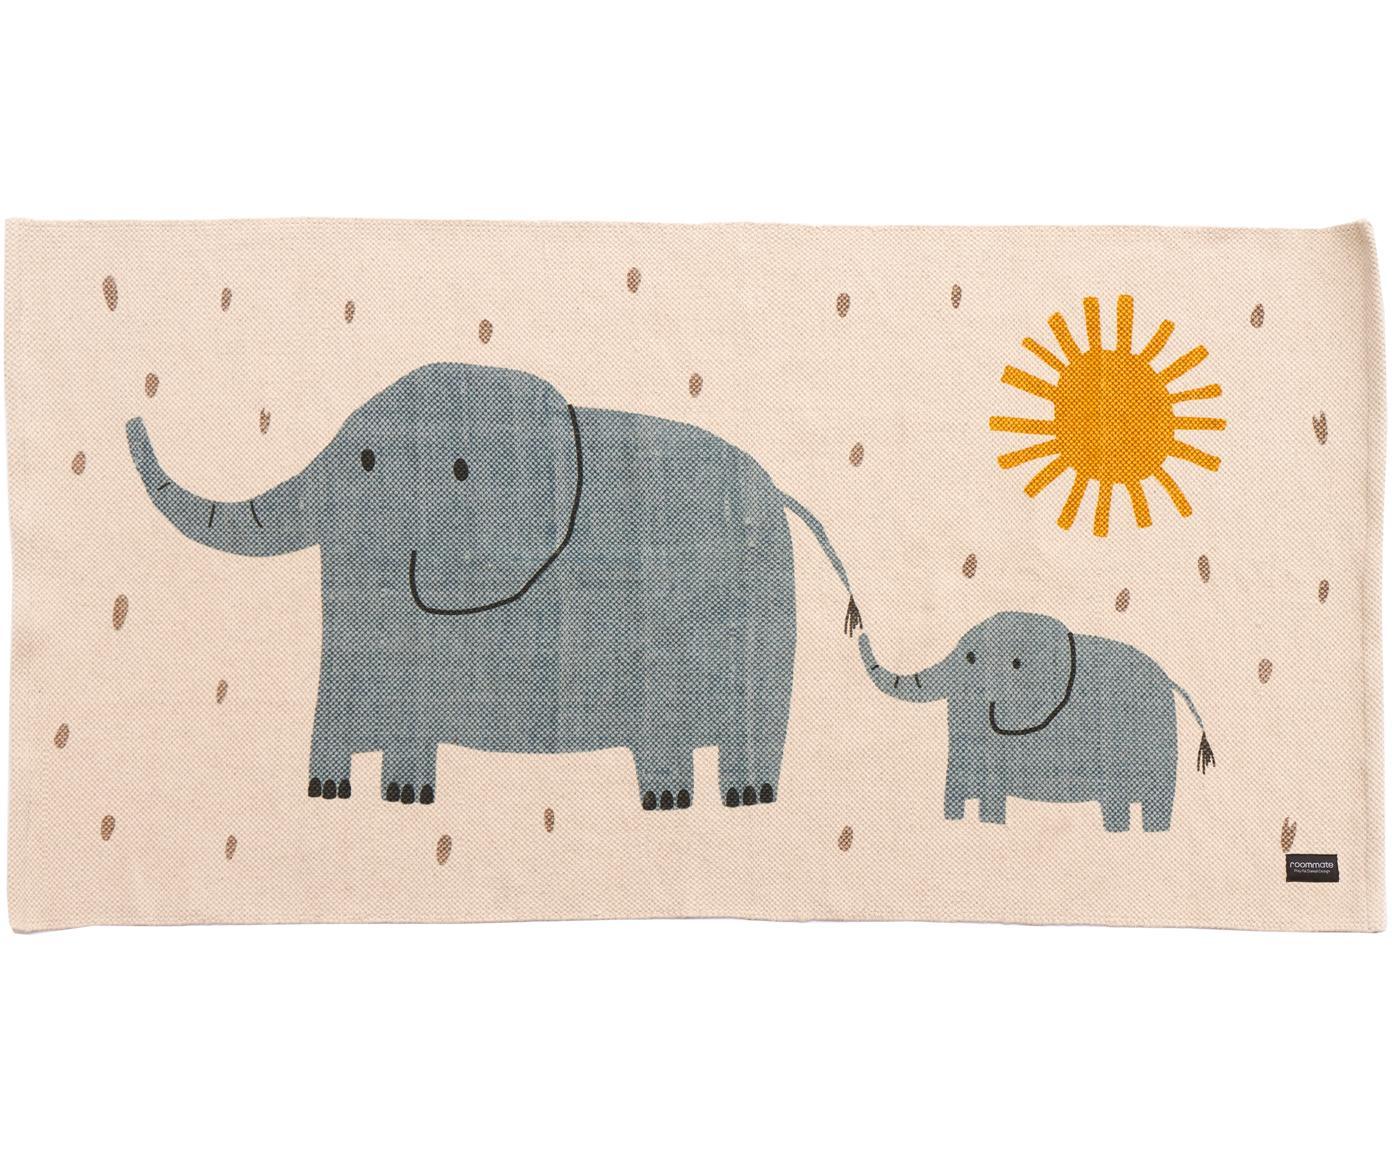 Teppich Elephant, Baumwolle, Gebrochenes Weiss, 70 x 140 cm